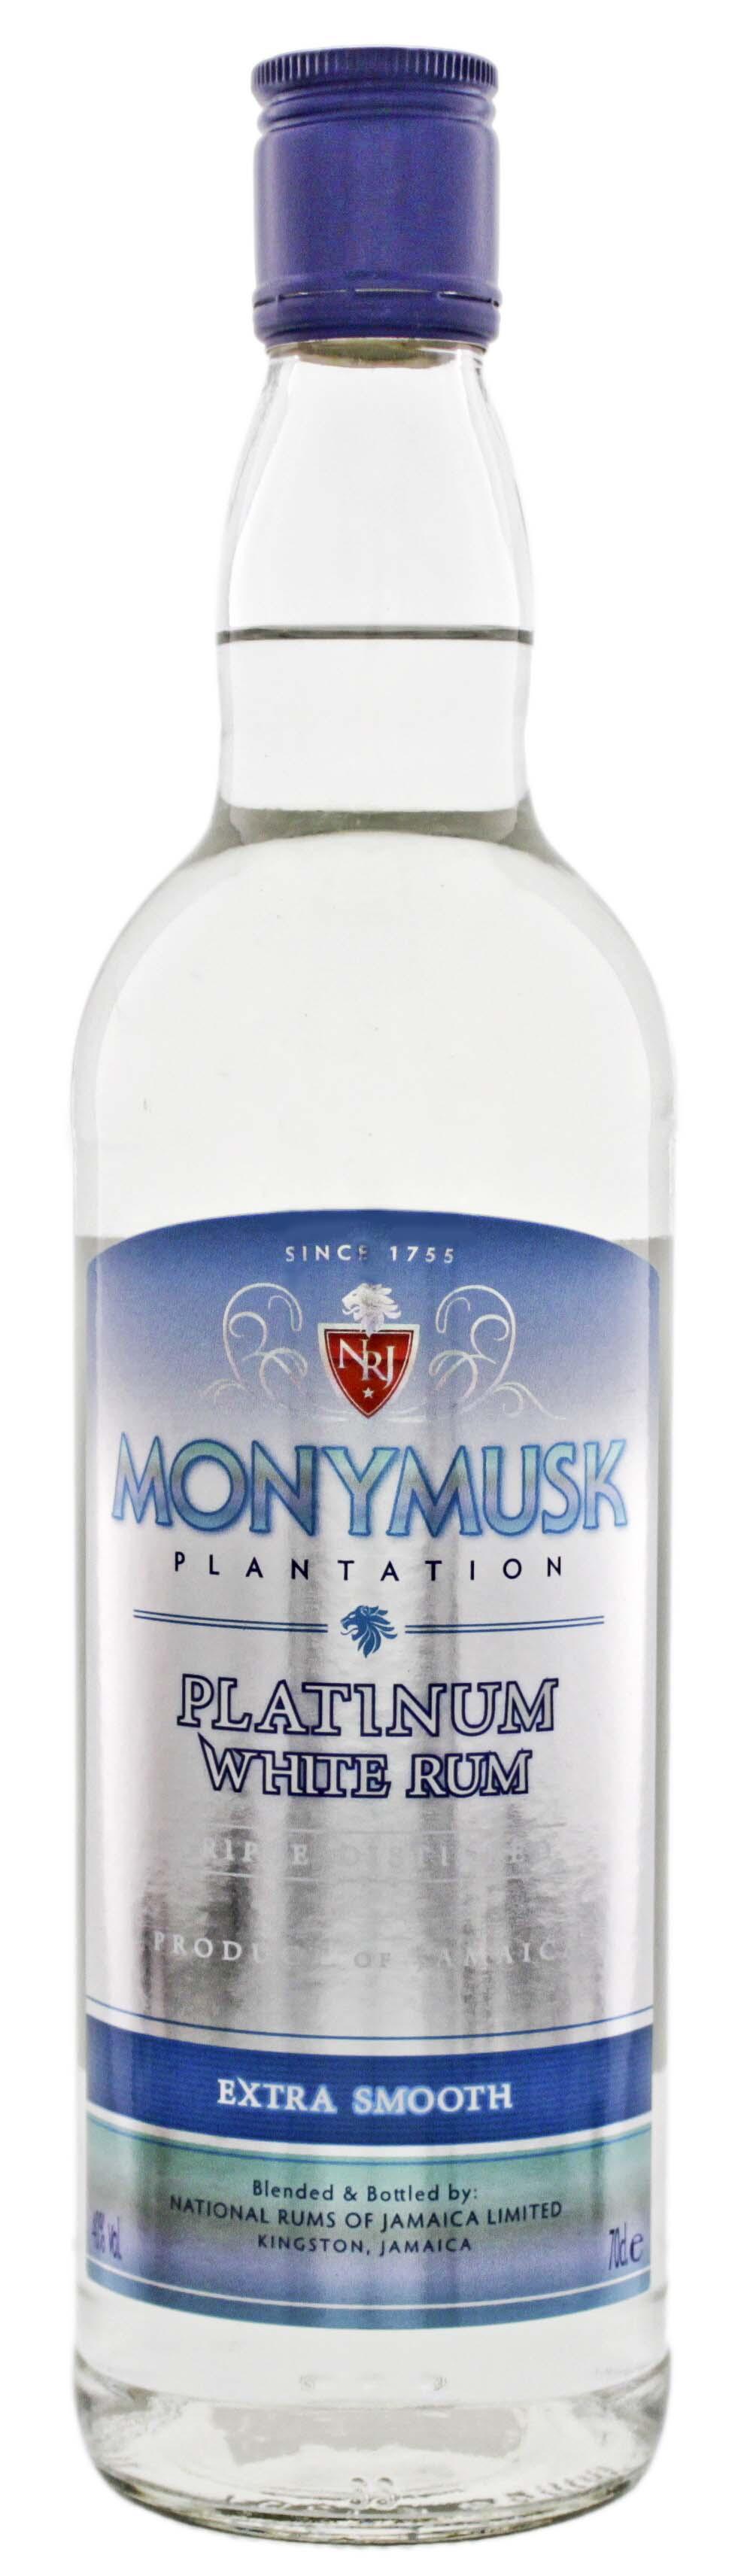 Monymusk Plantation Platinum White Rum 0,7L